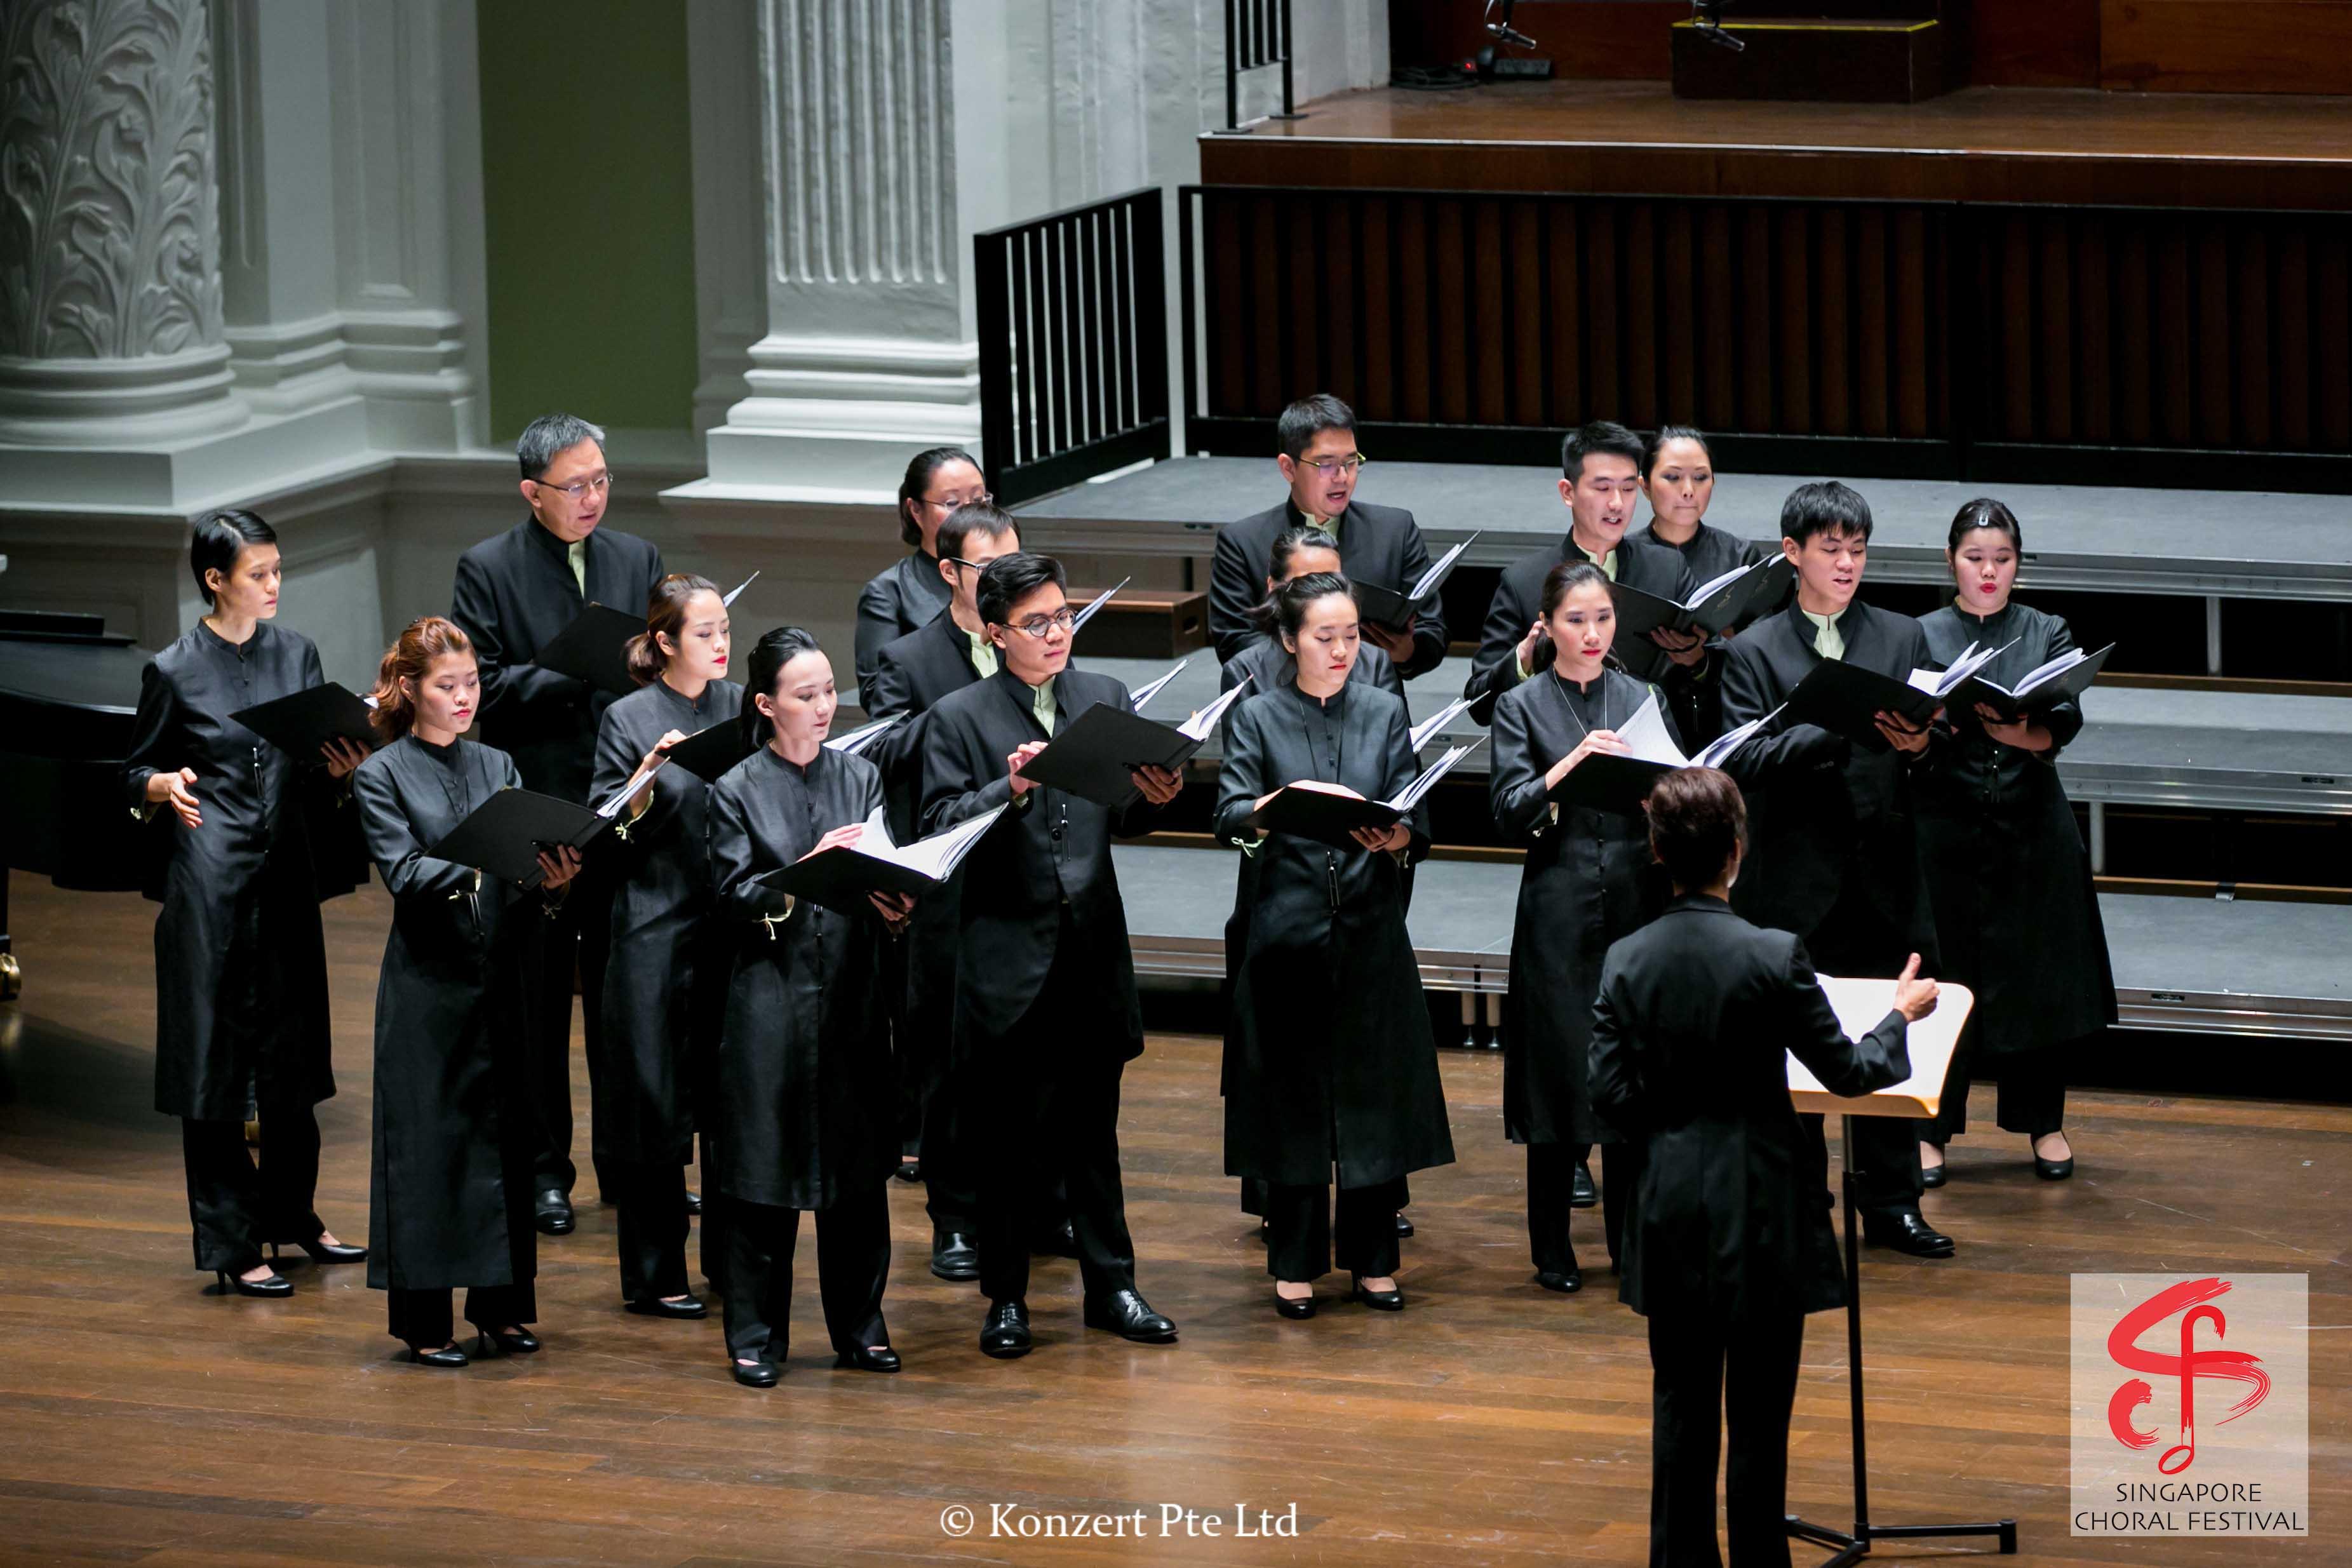 Singapore Choral Festival 8-8-15 (233).jpg